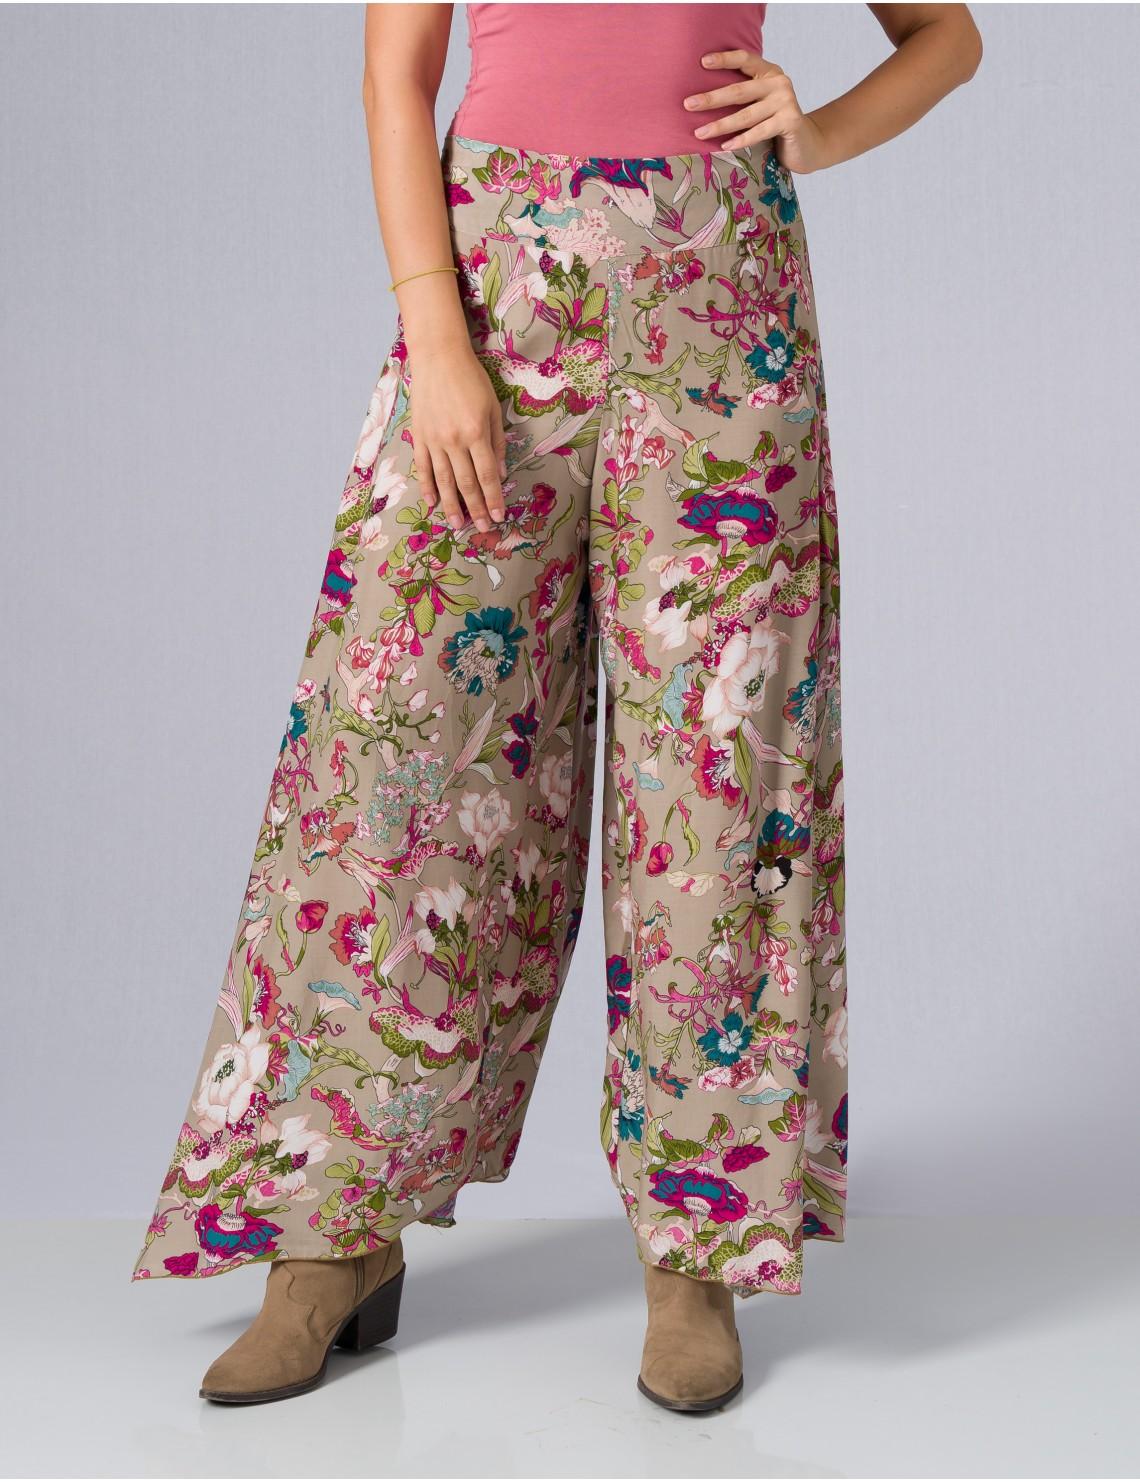 Gili Pant - Japonese Floral Grey